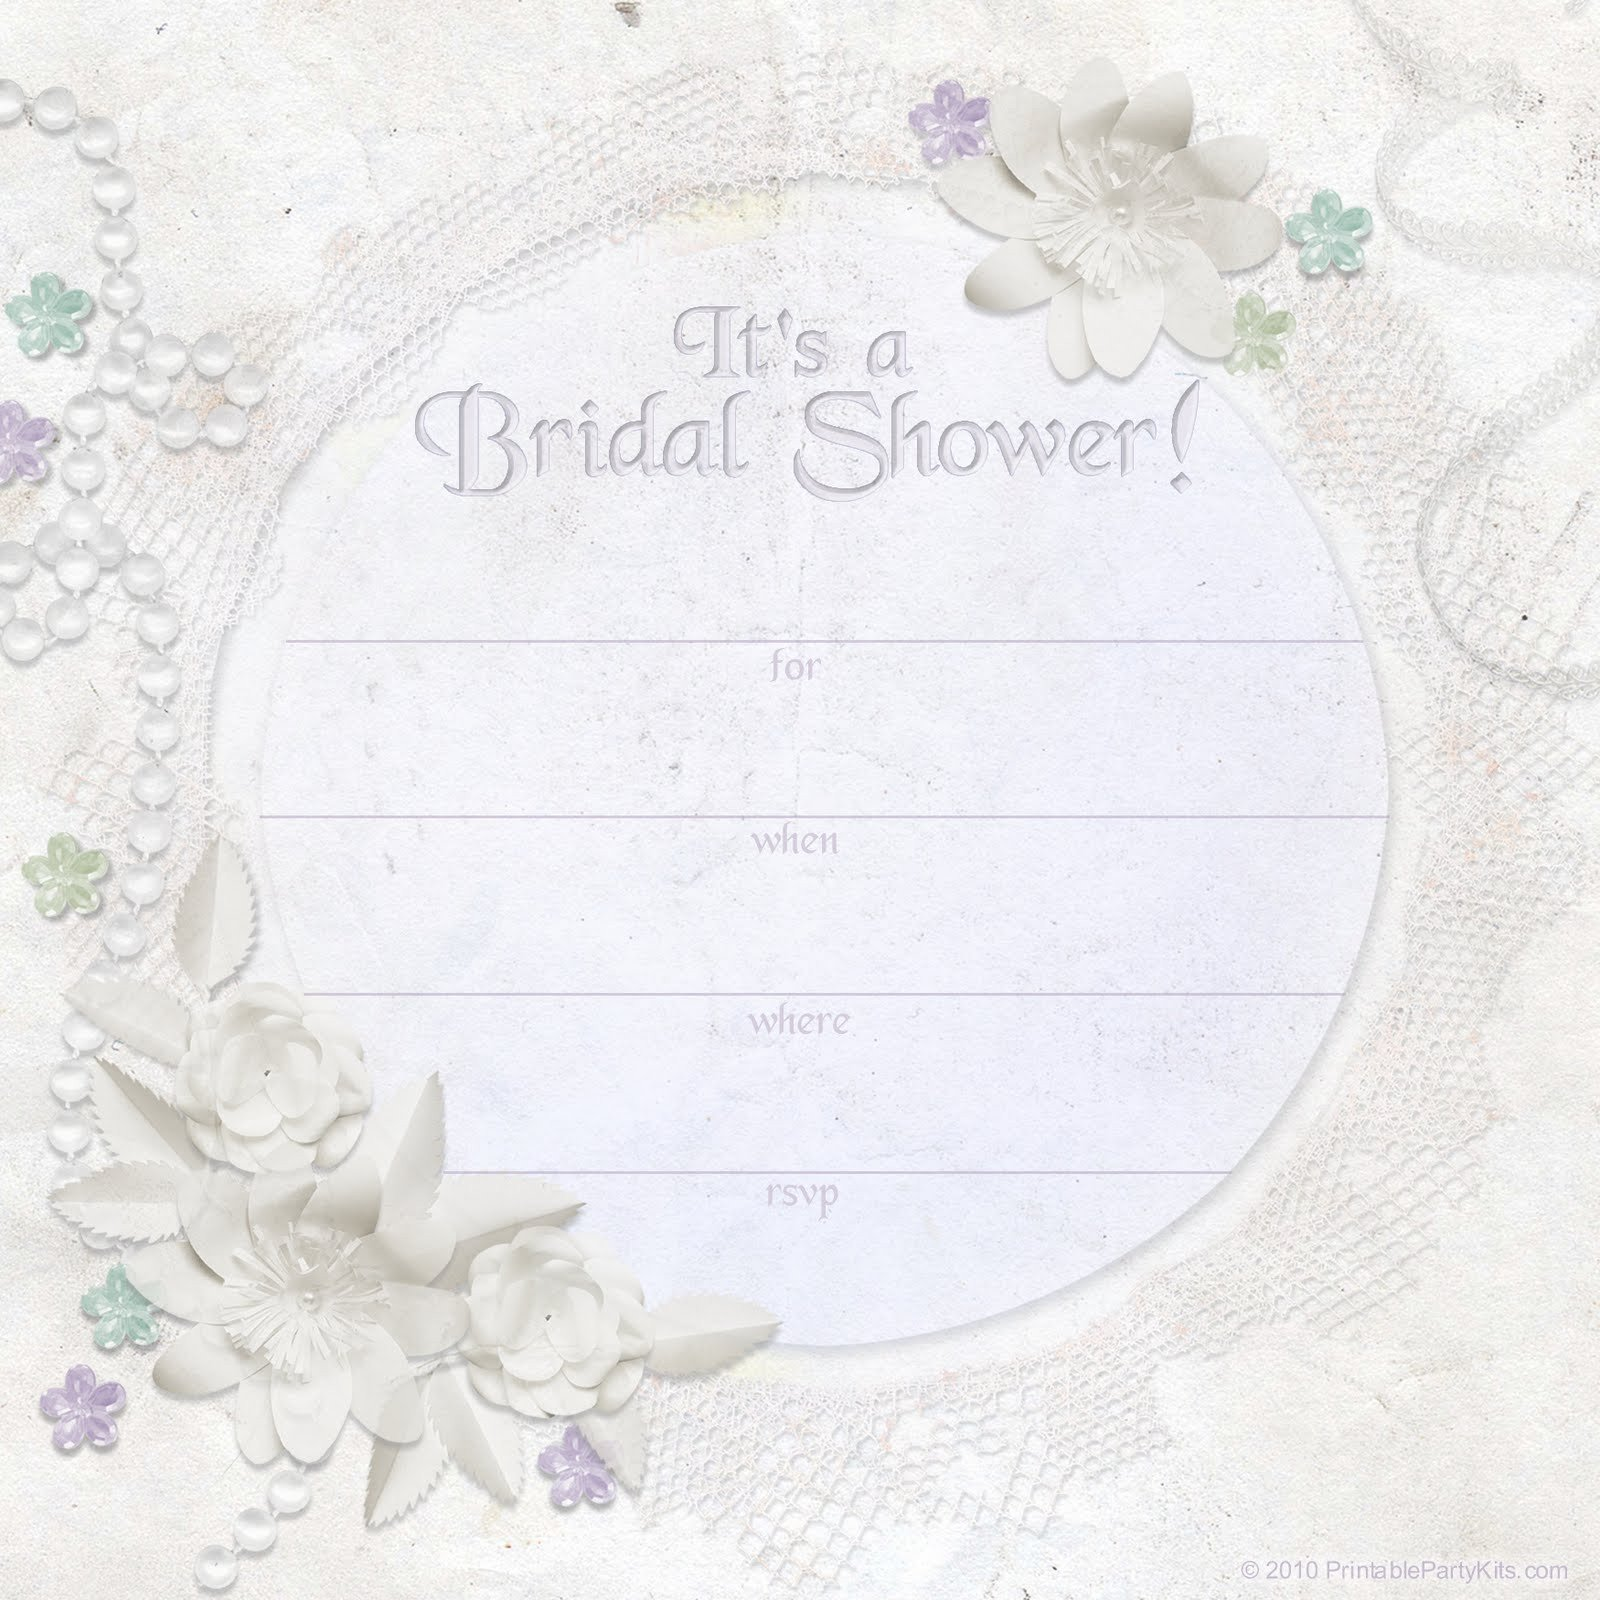 Free Bridal Shower Templates Free Printable Bridal Shower Invitations